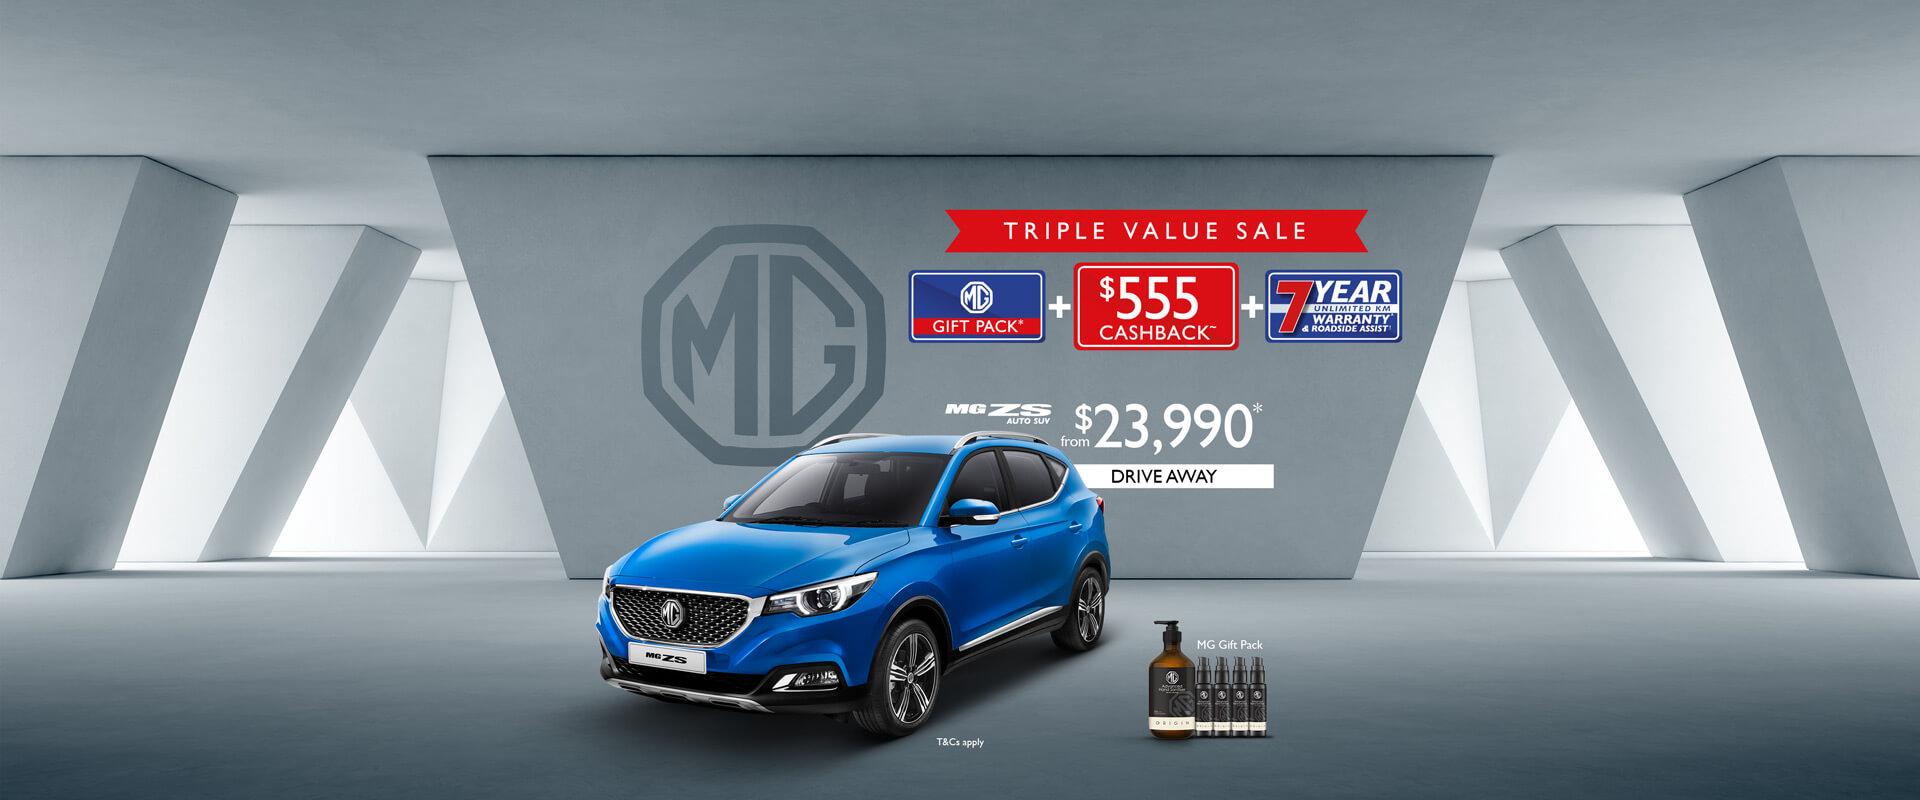 MG ZS Triple Value Sale